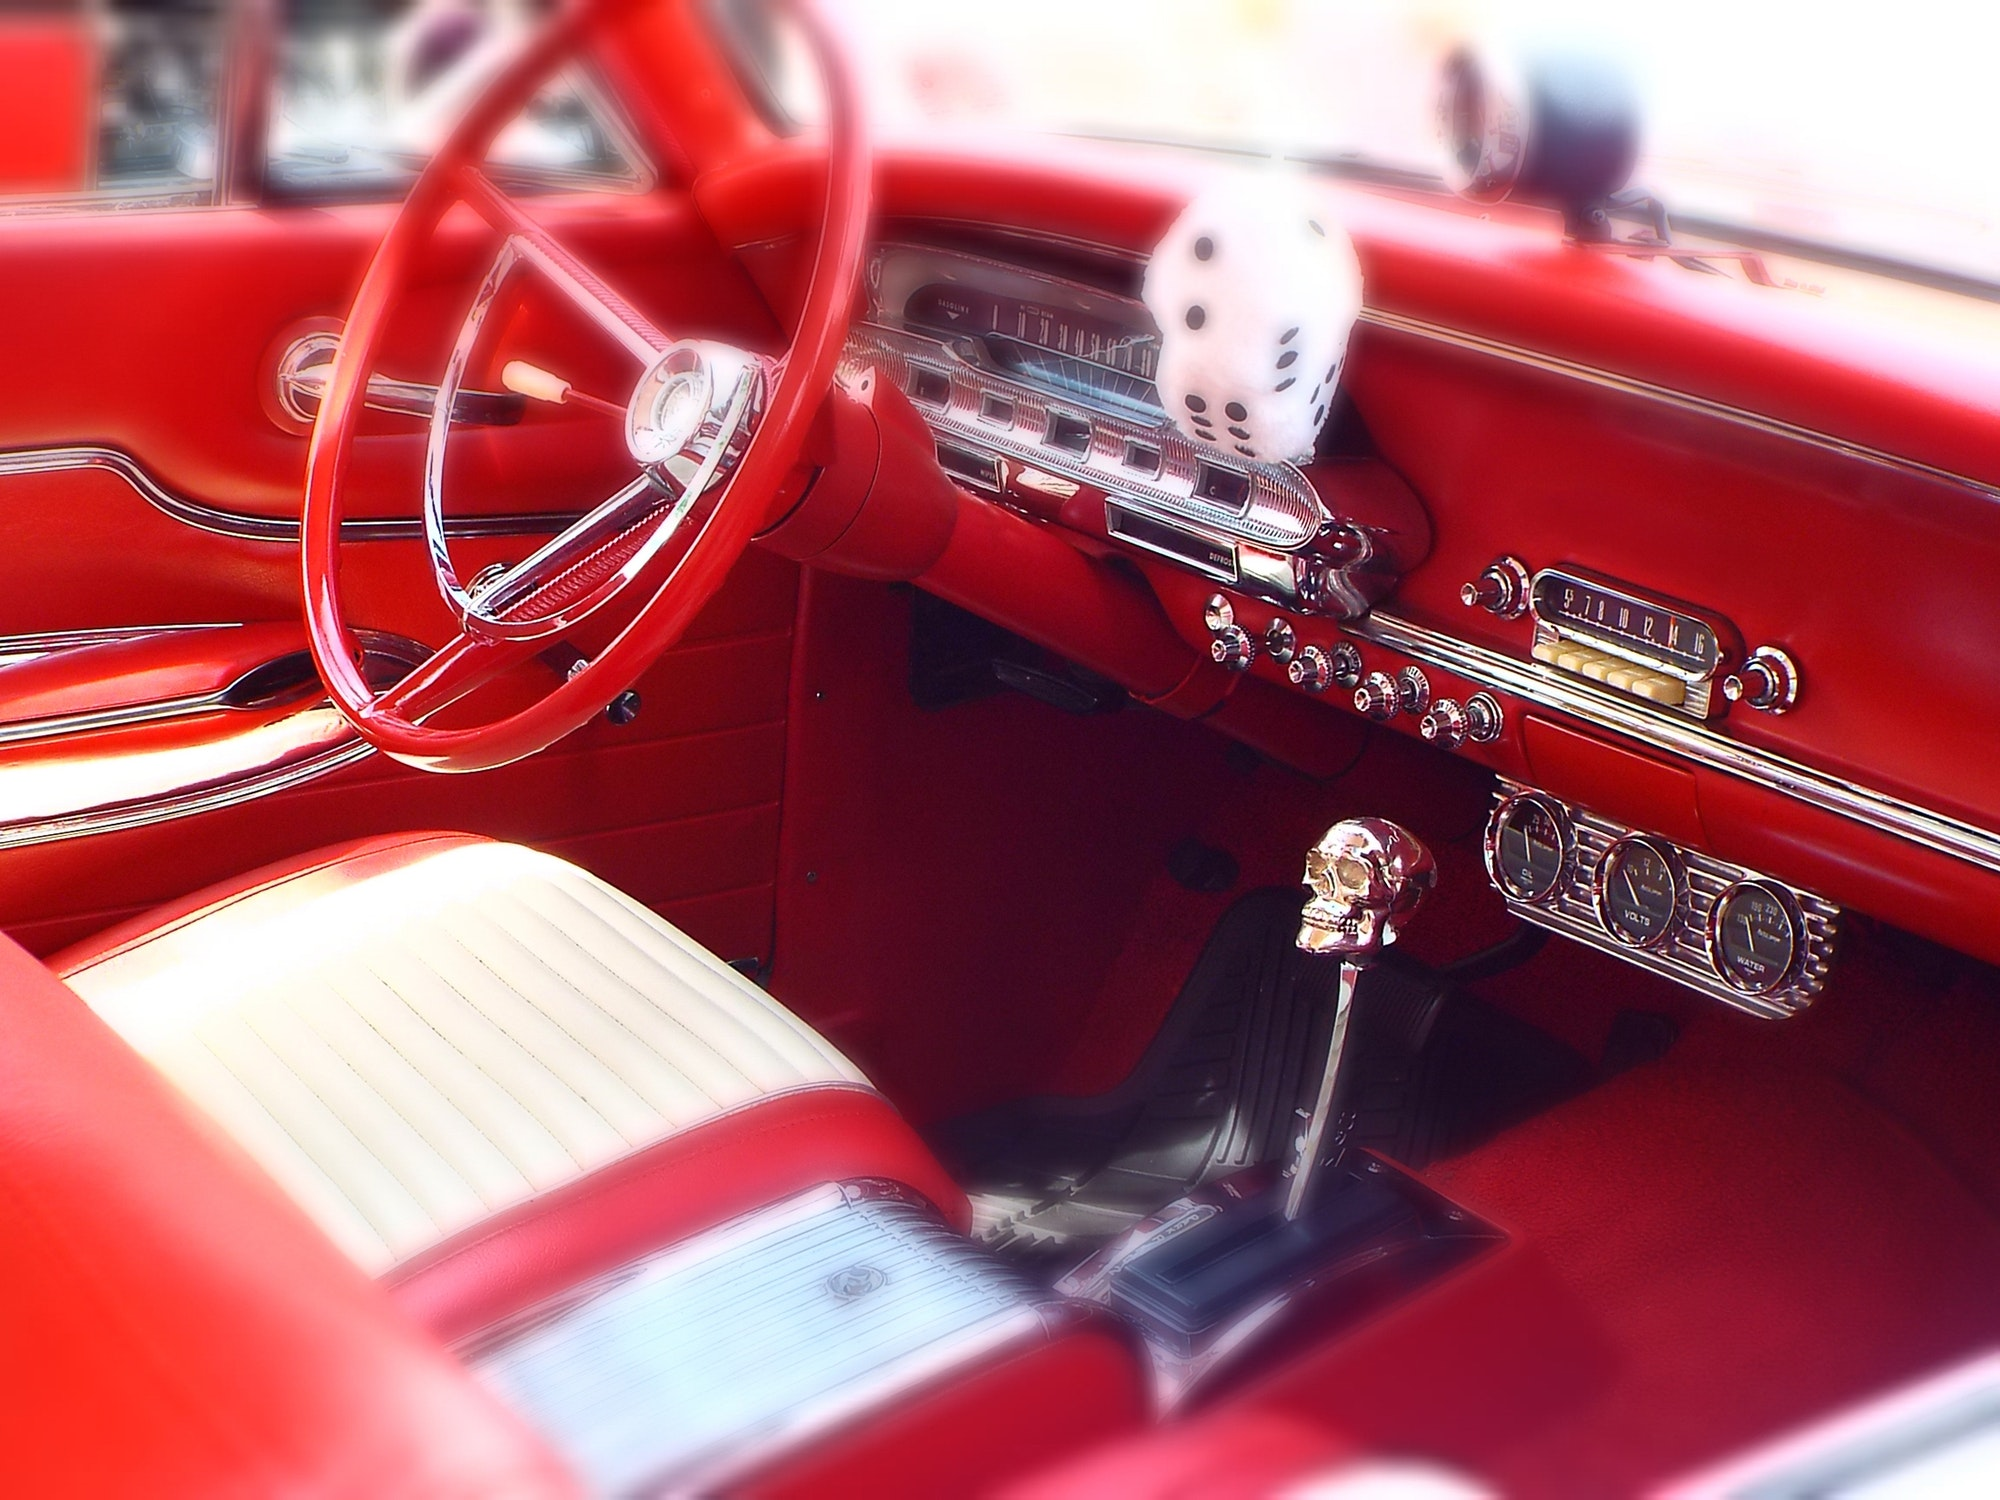 Servicios taller Interior of a red hot rod with skull gear shifter